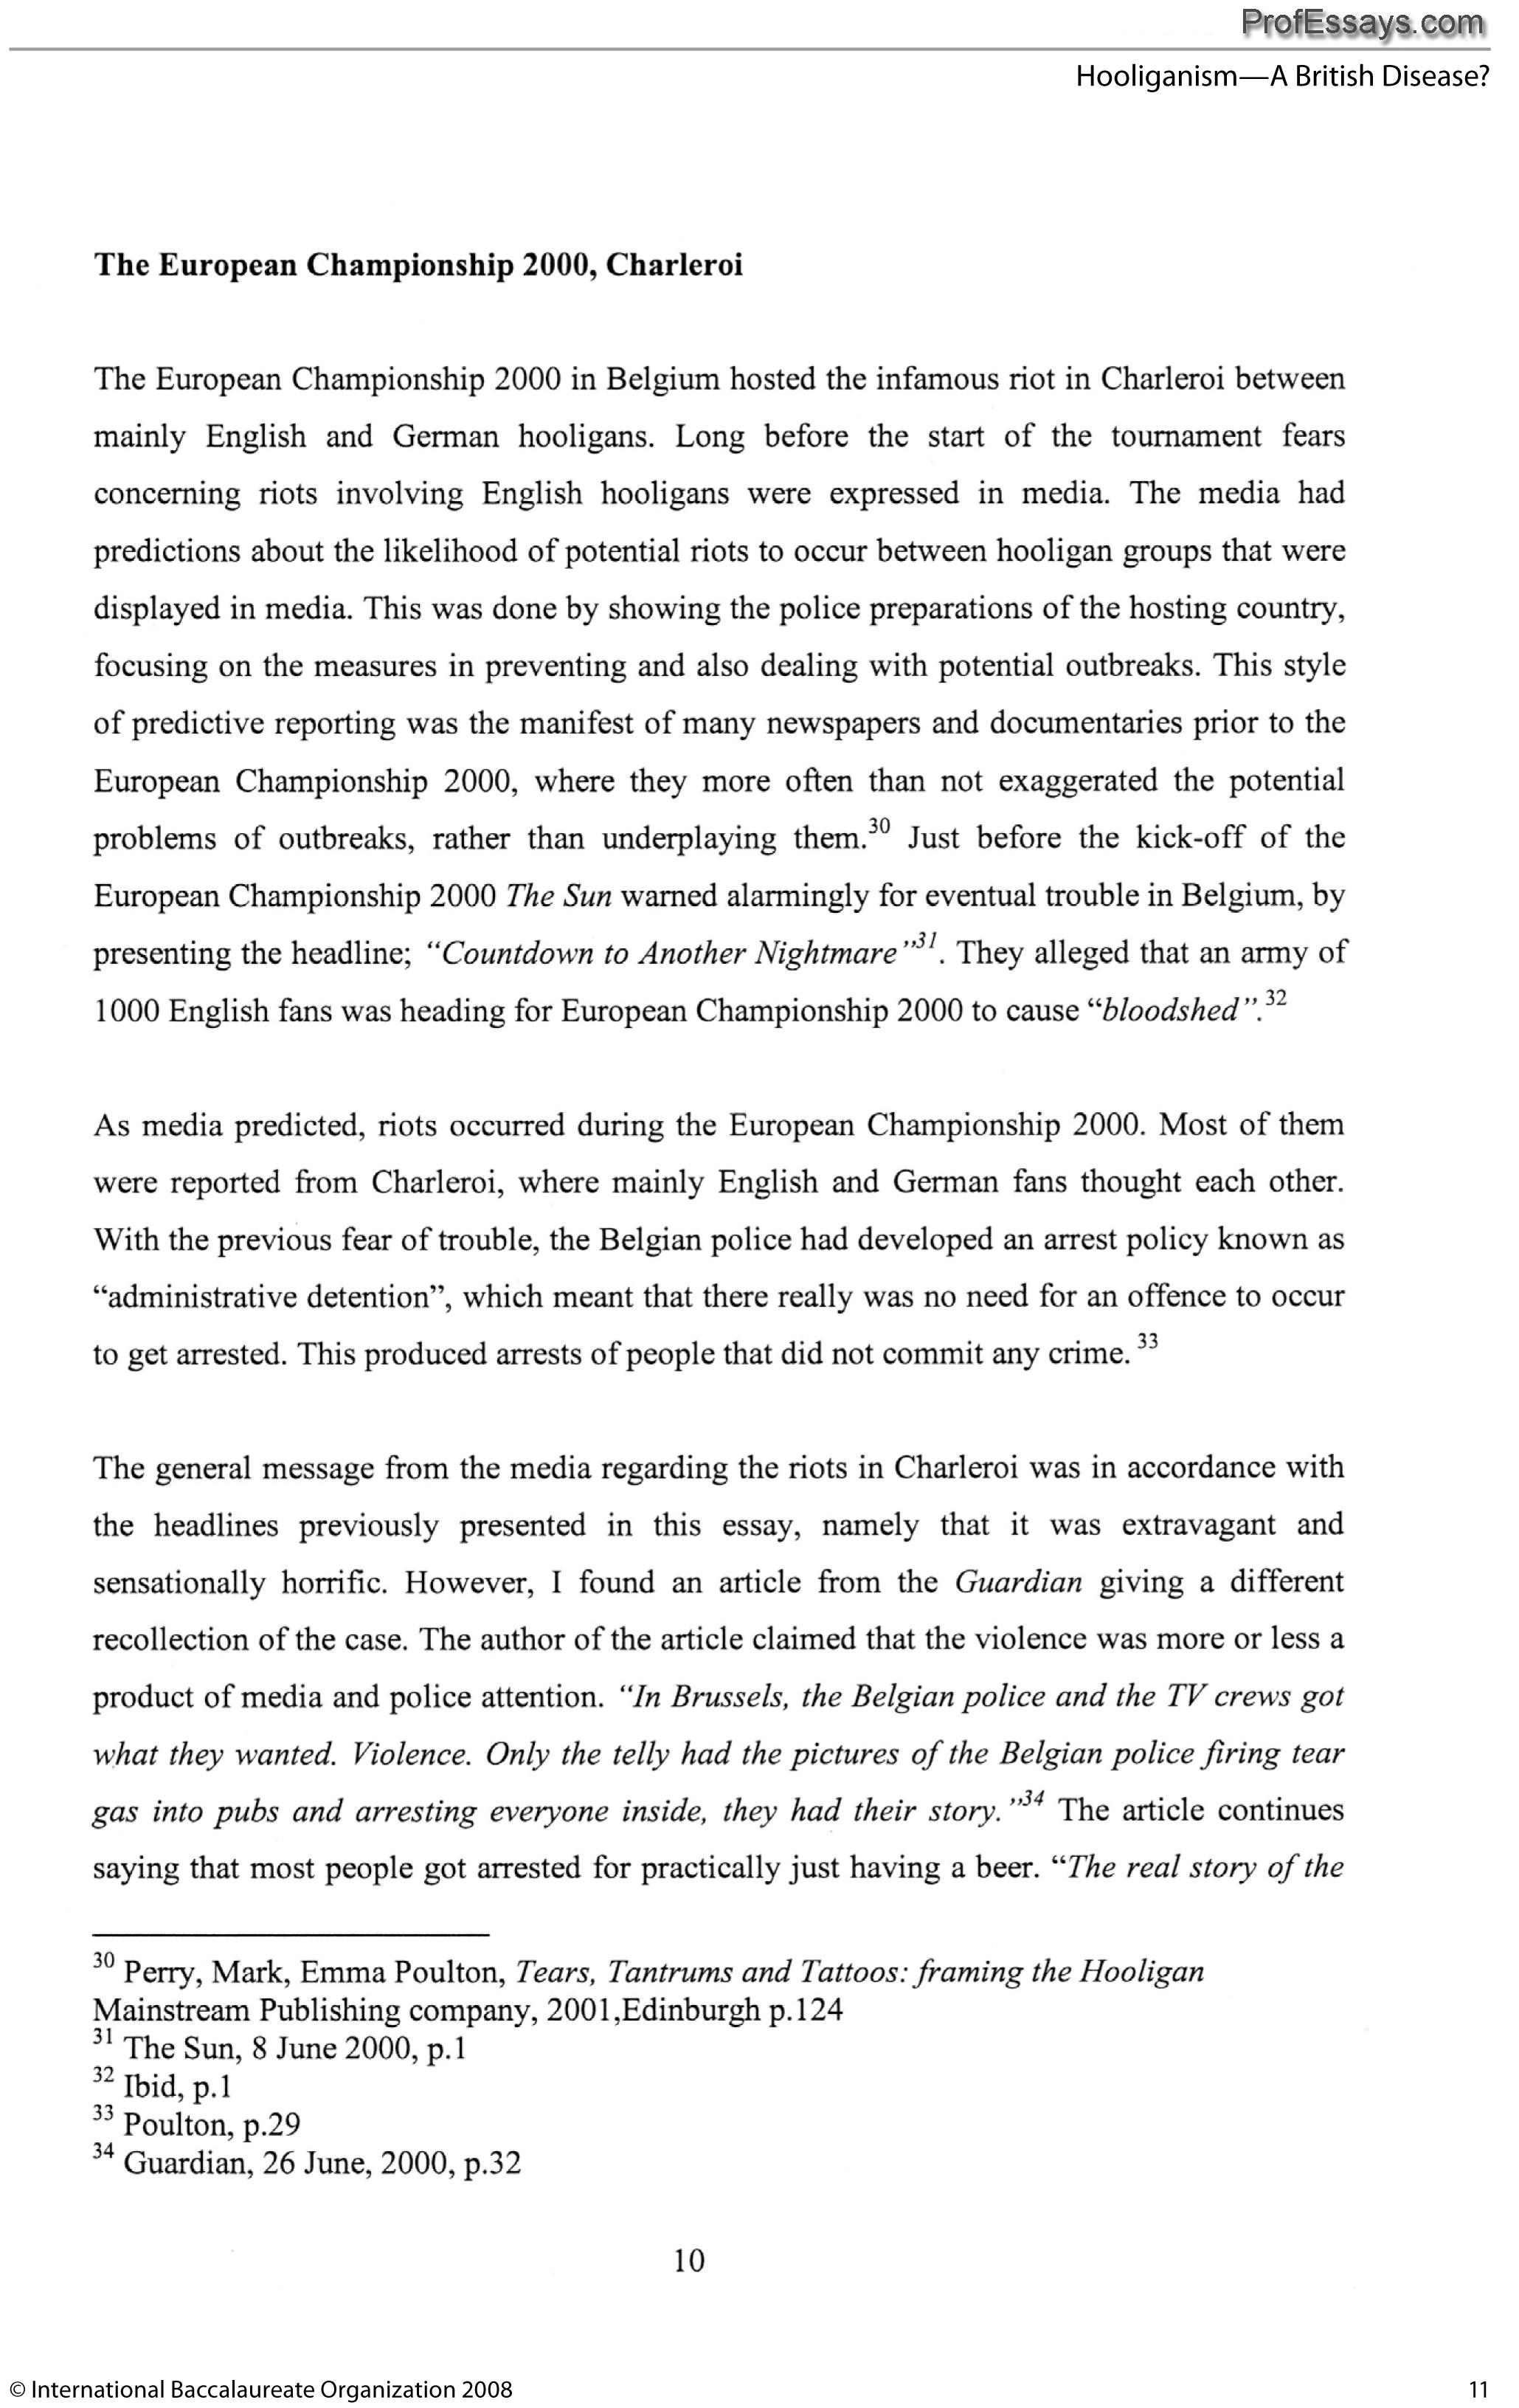 004 English Essay Topics Example Ib Extended Free Dreaded Literature Question Paper For Class 10 Icse 2015 Maharashtra Board Full